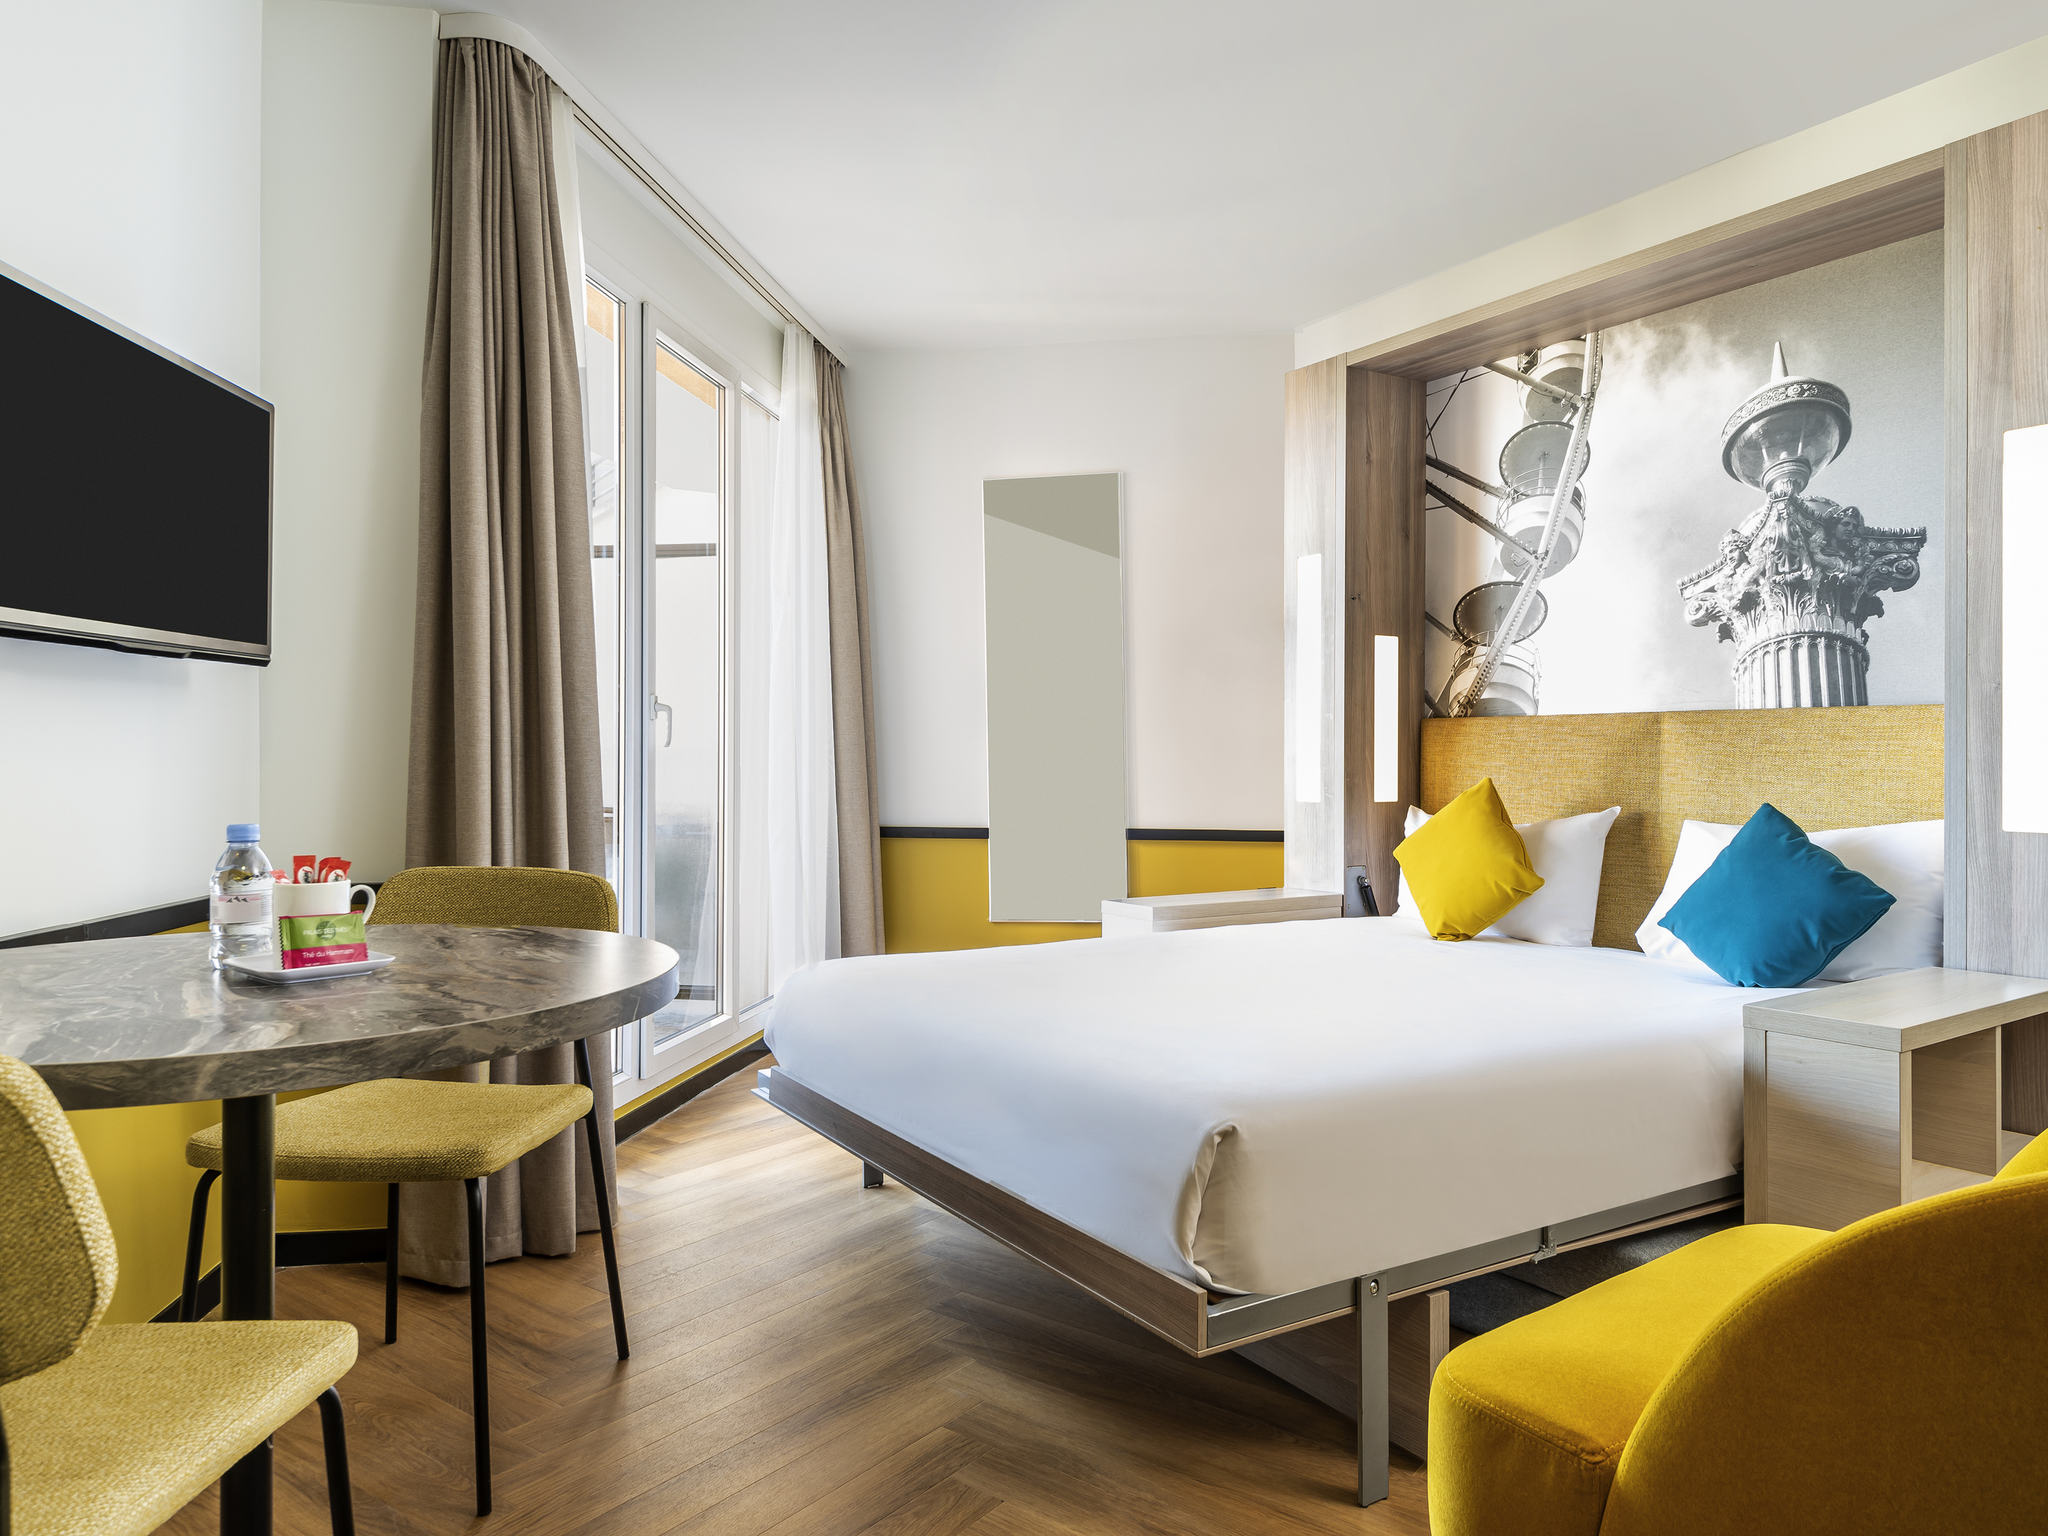 فندق - Aparthotel Adagio Paris Montrouge